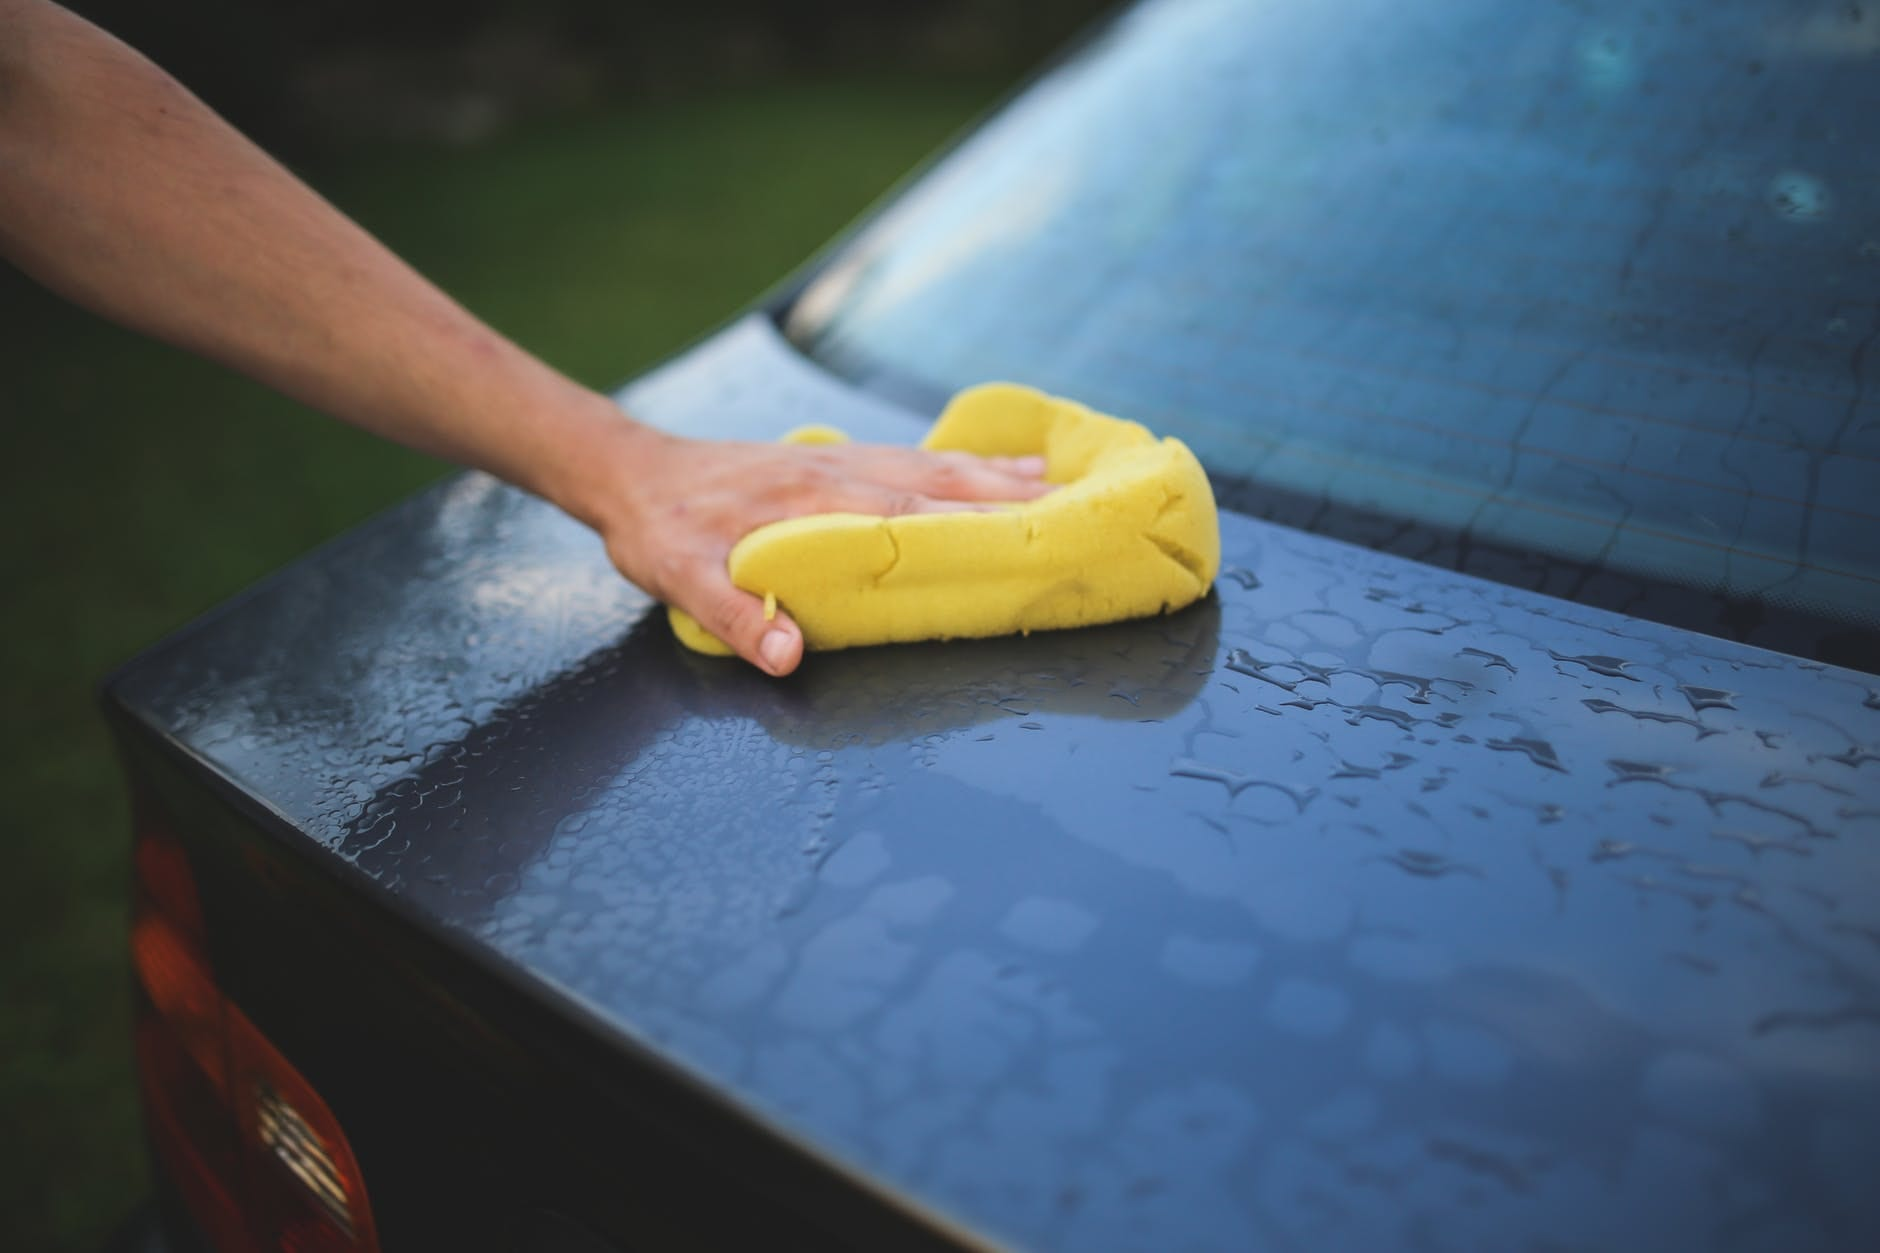 professional cleaners in birmingham